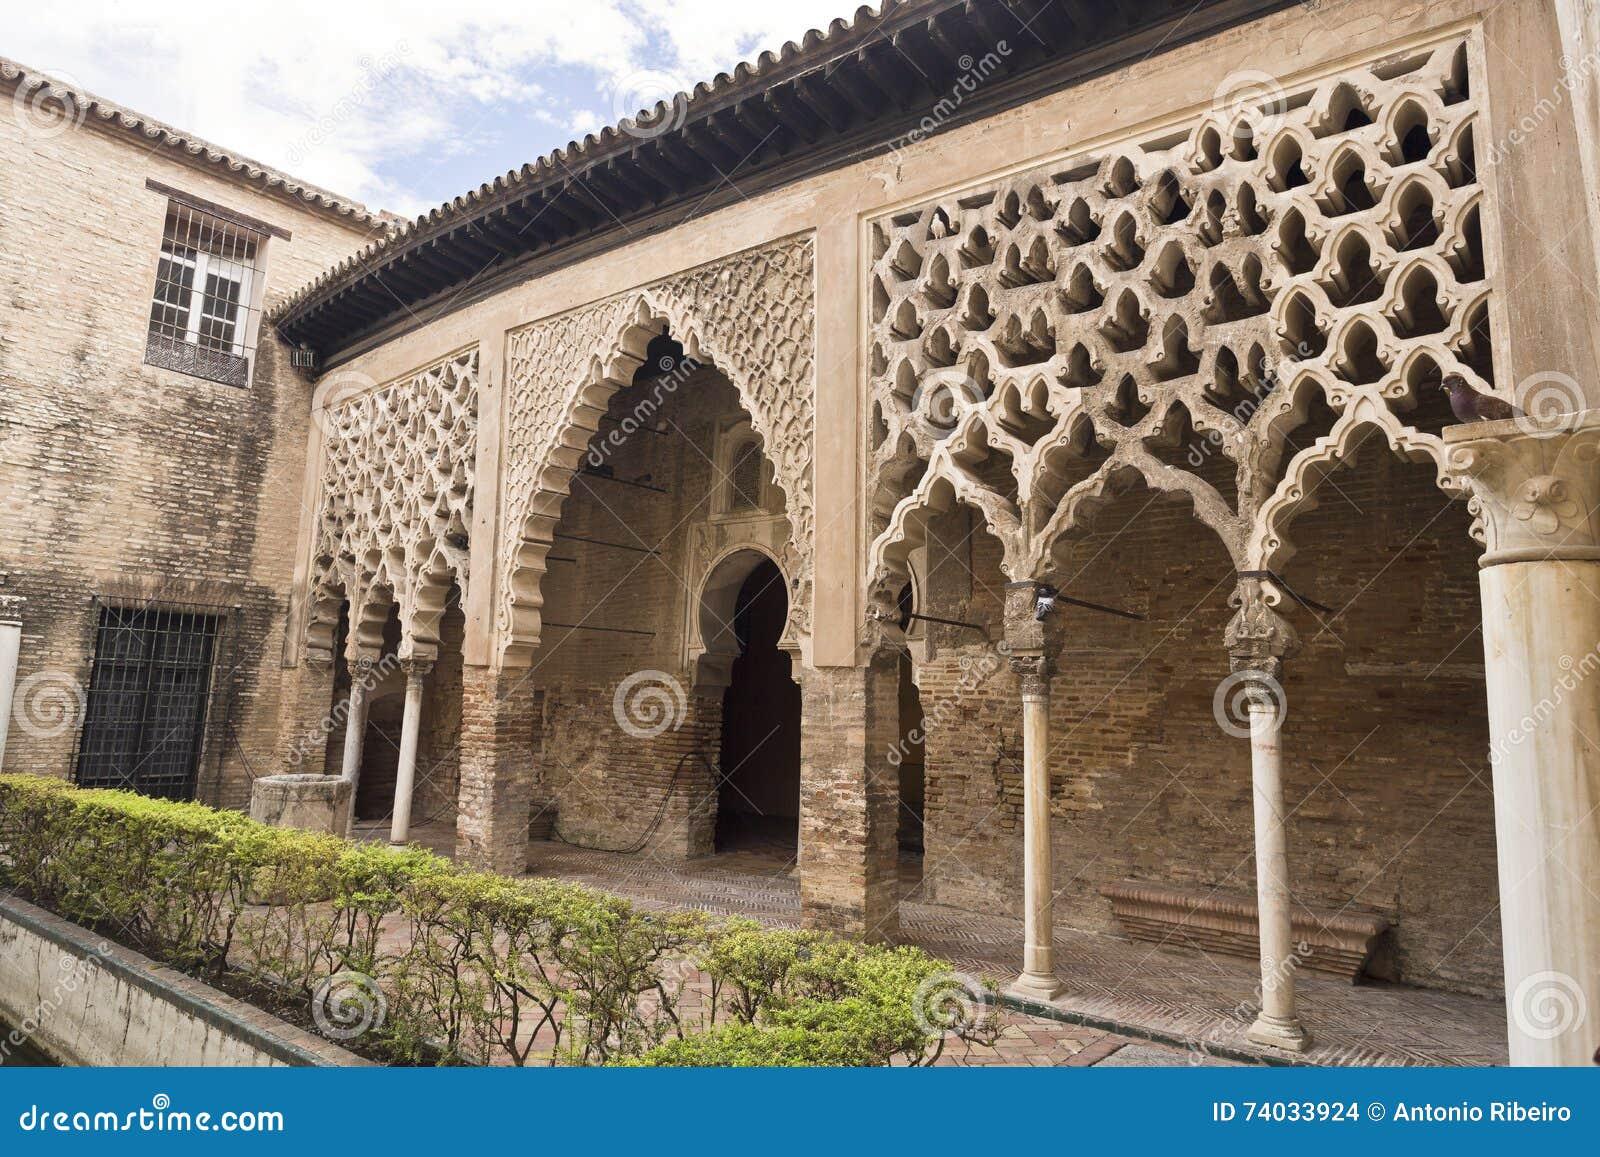 Alcazar Almohad Palace